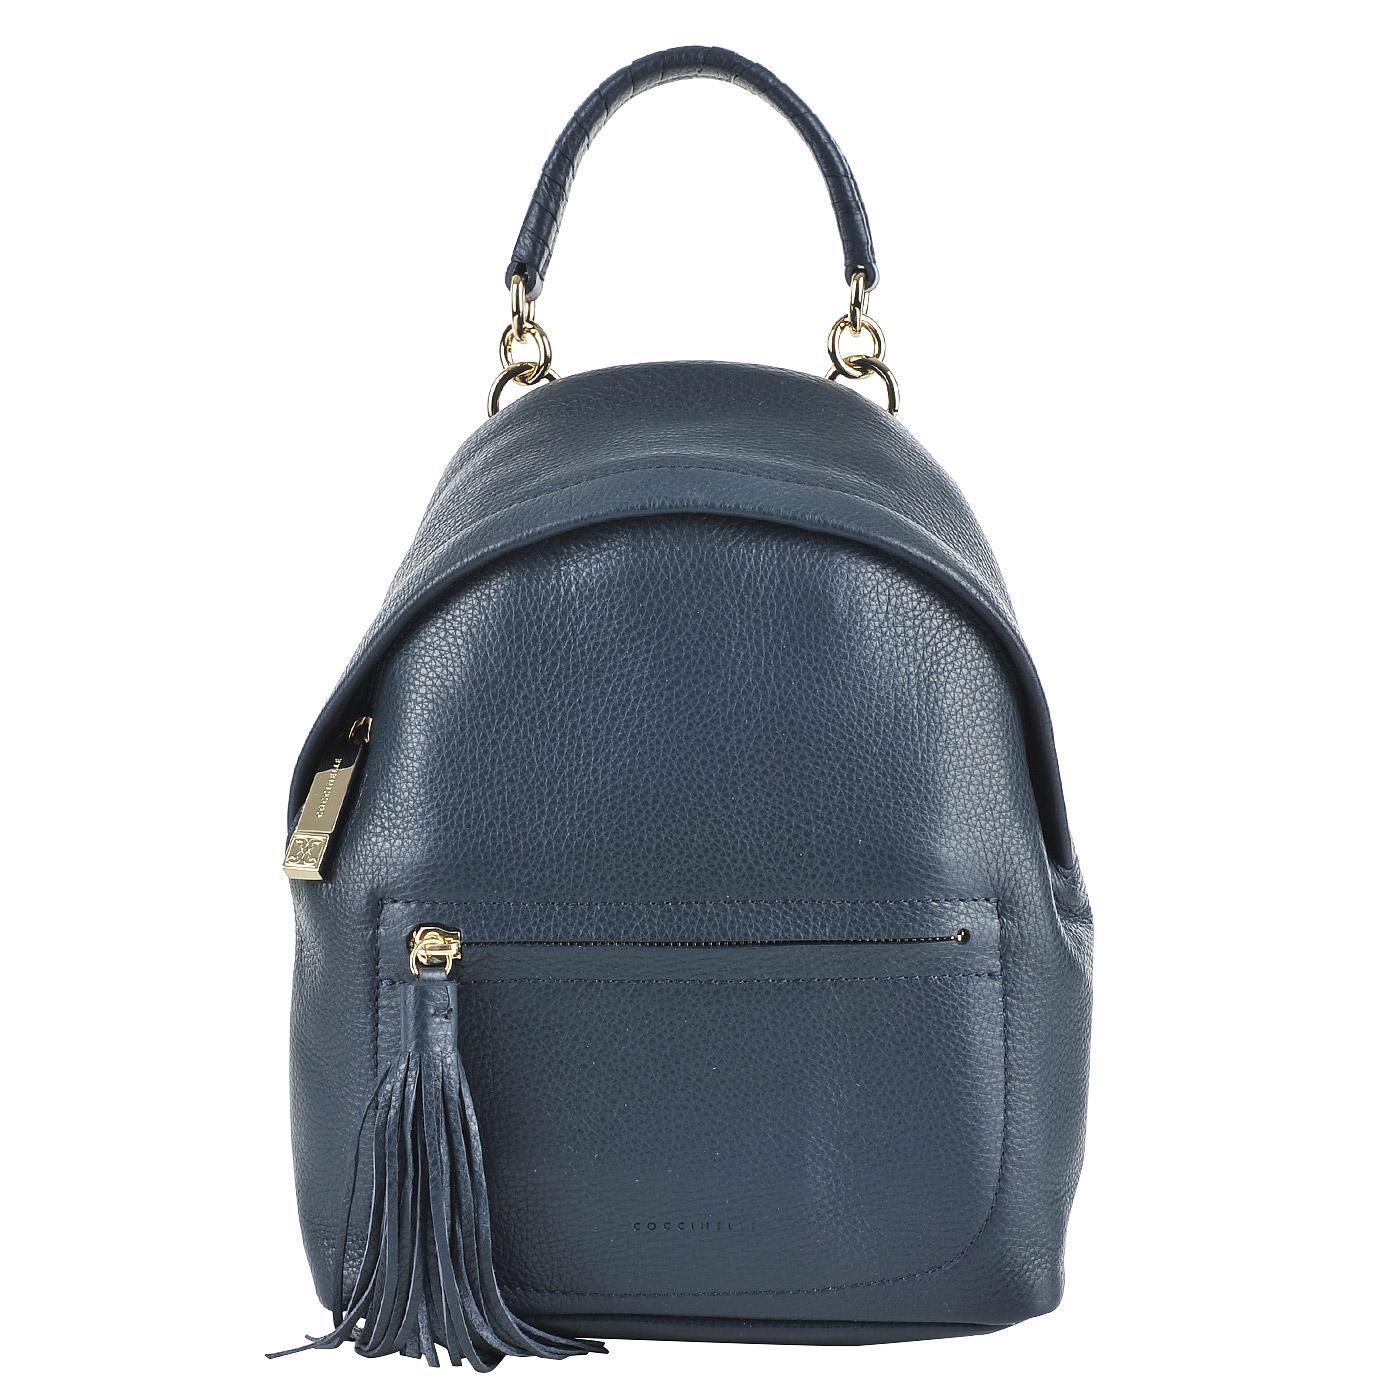 69991ff67eaa Женский кожаный рюкзак Coccinelle Minibag Женский кожаный рюкзак Coccinelle  Minibag ...